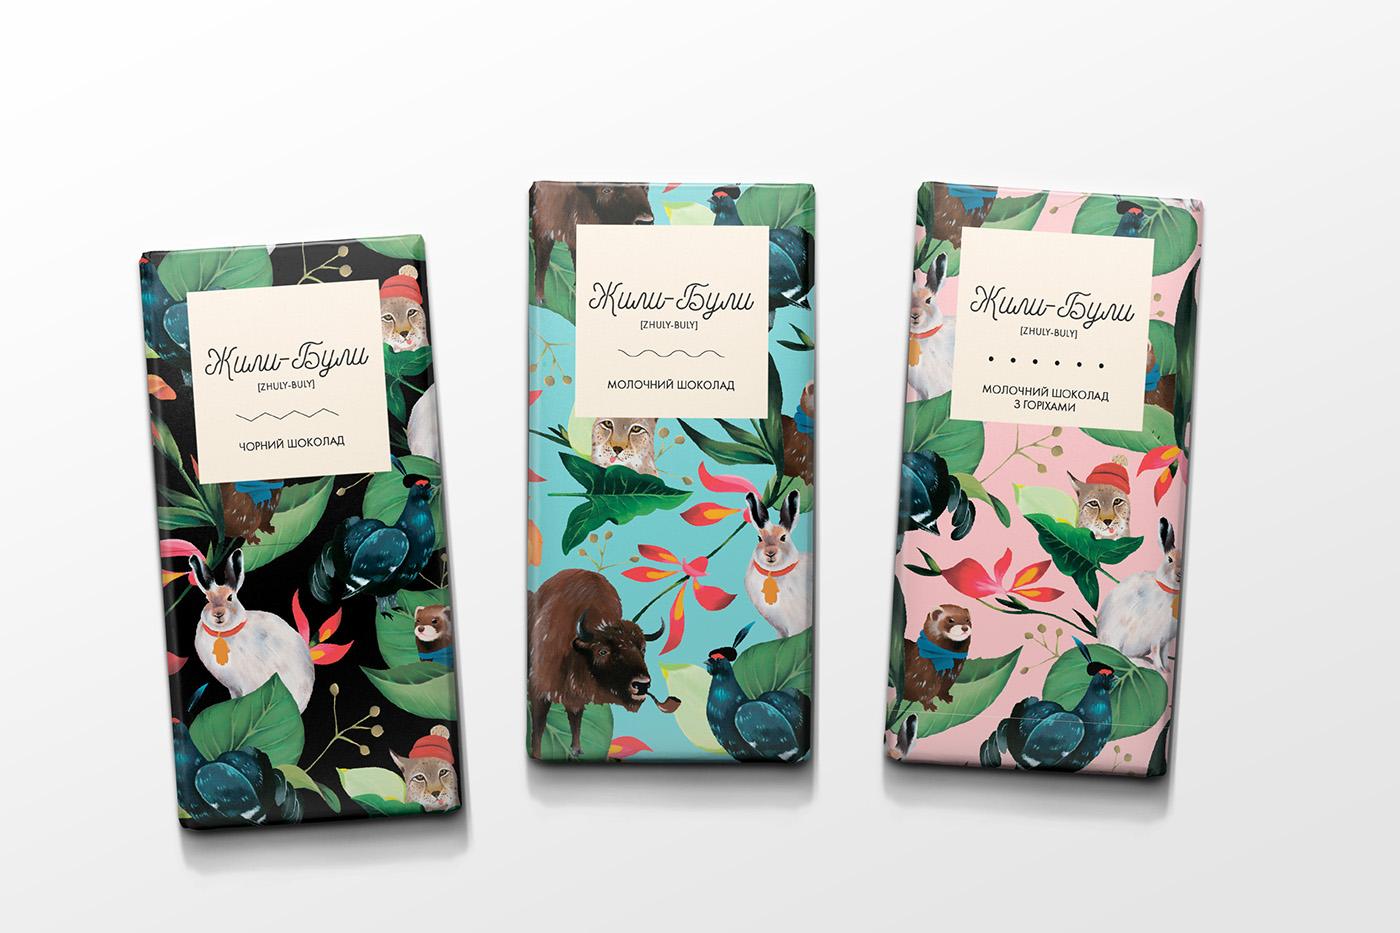 Zhuli-Buli Chocolate Packing by Inna Voevodina